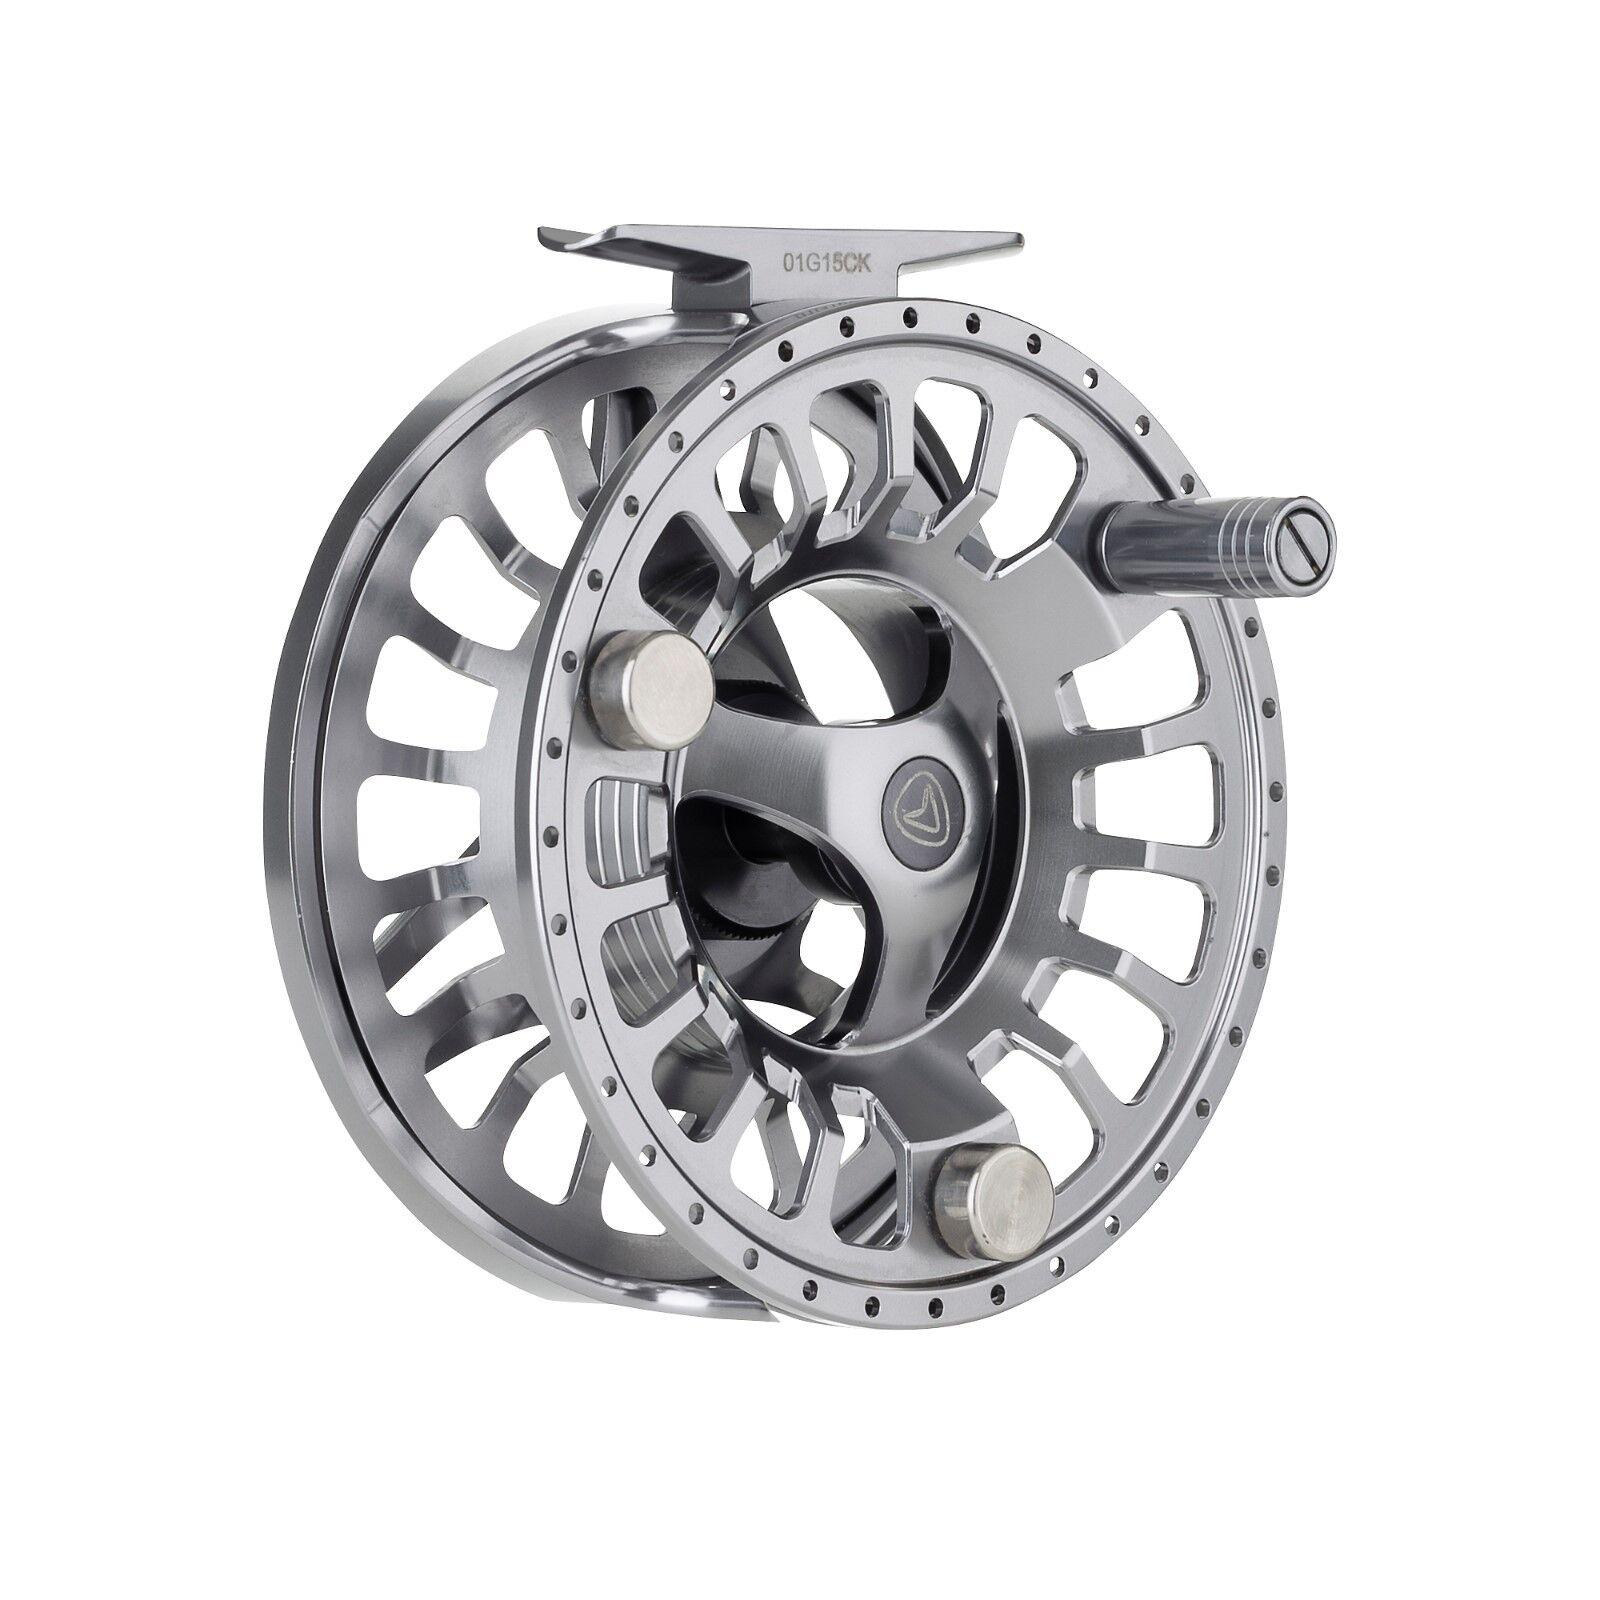 Greys NEW GTS 900 Fly Fishing Reels - All Models